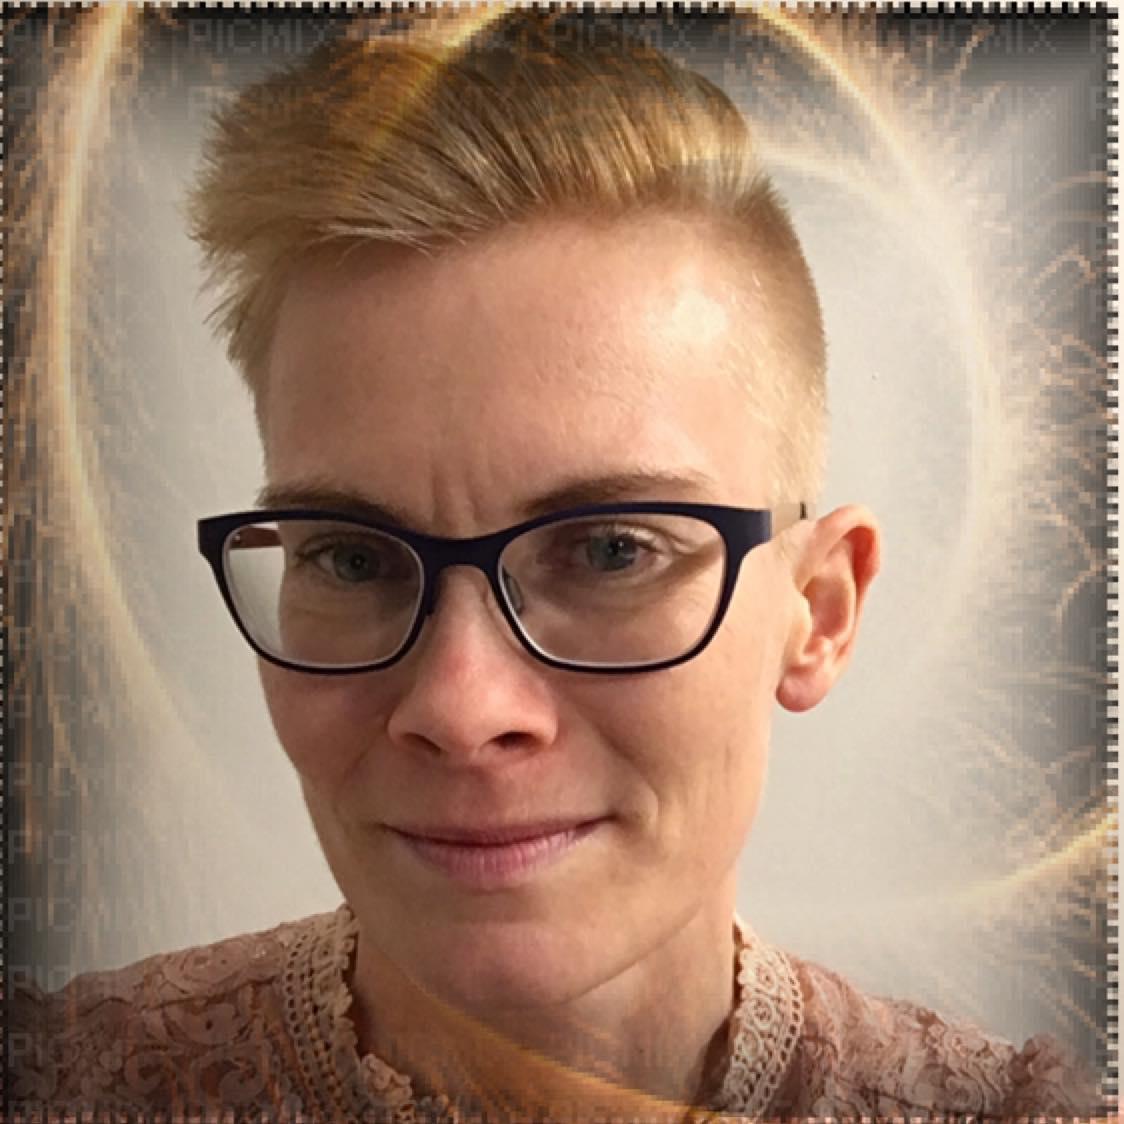 Lise Skærris